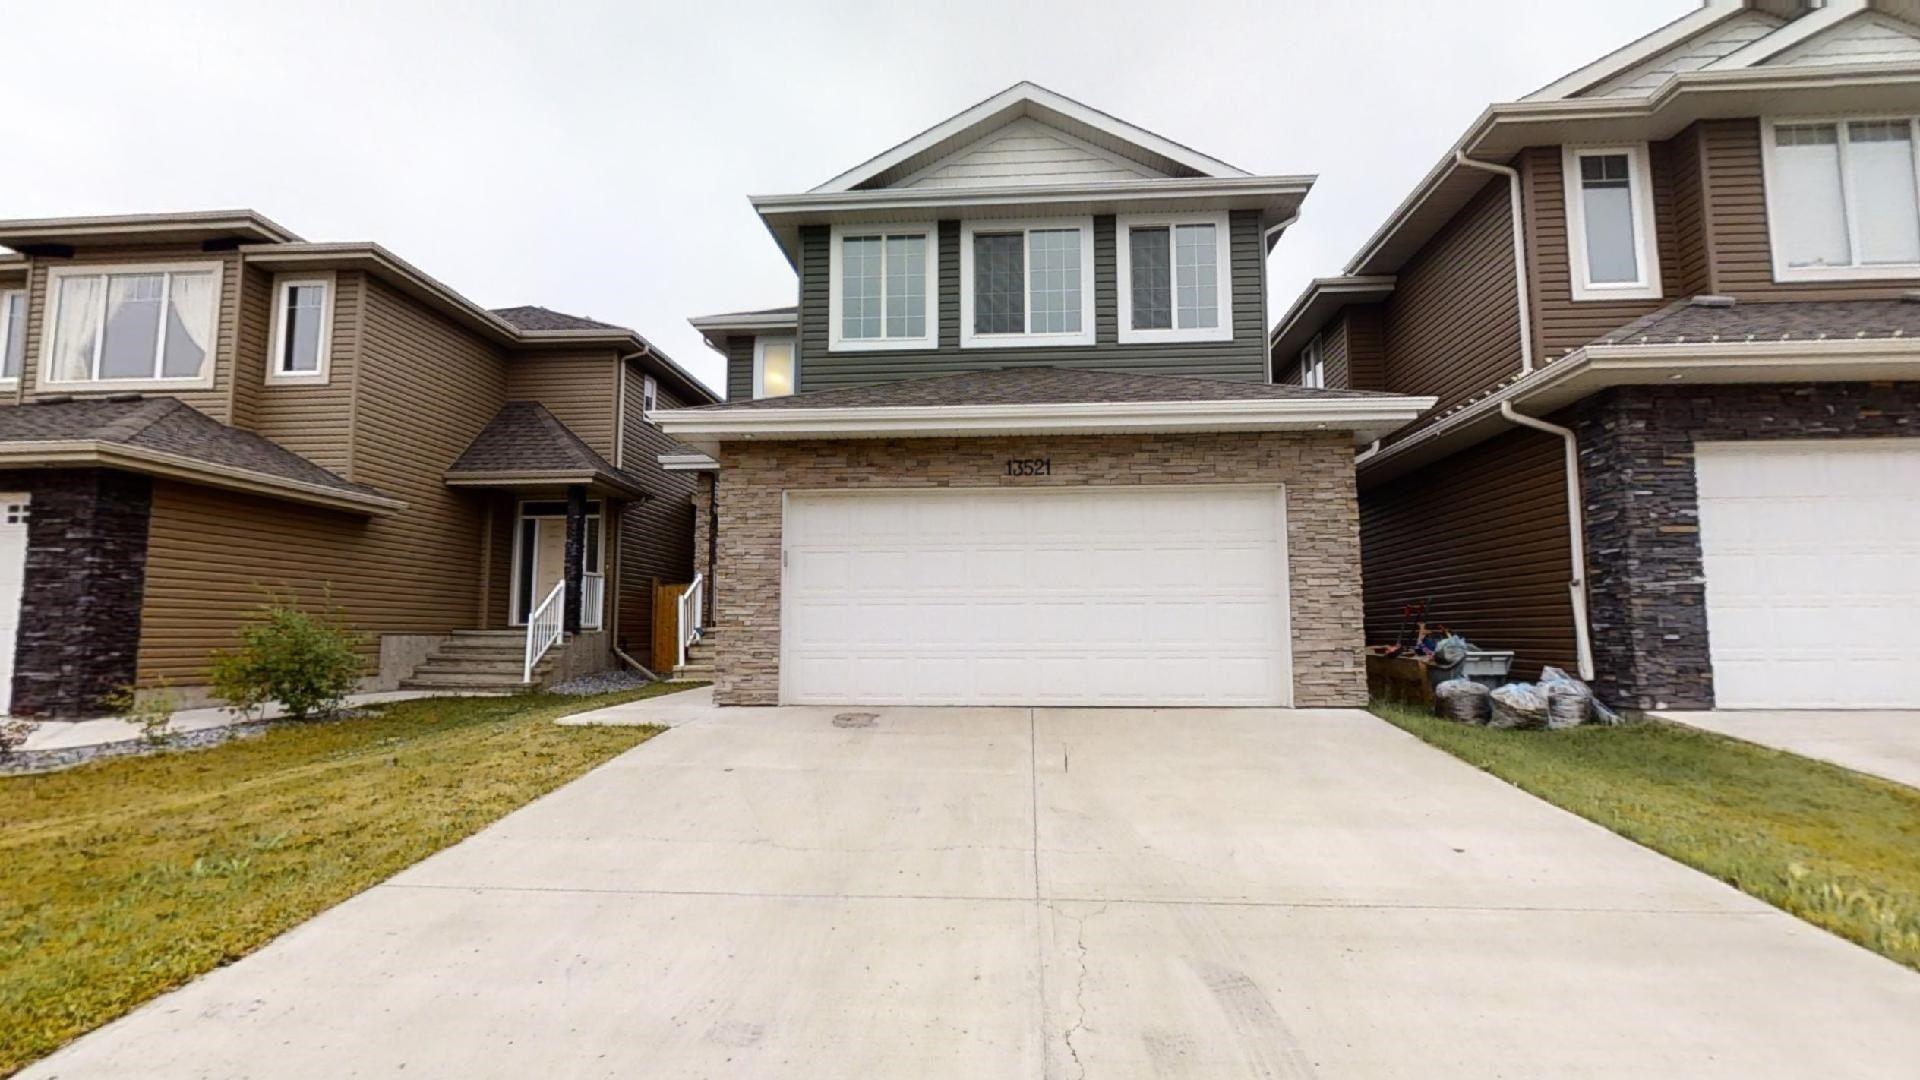 Main Photo: 13521 162A Avenue in Edmonton: Zone 27 House for sale : MLS®# E4254958